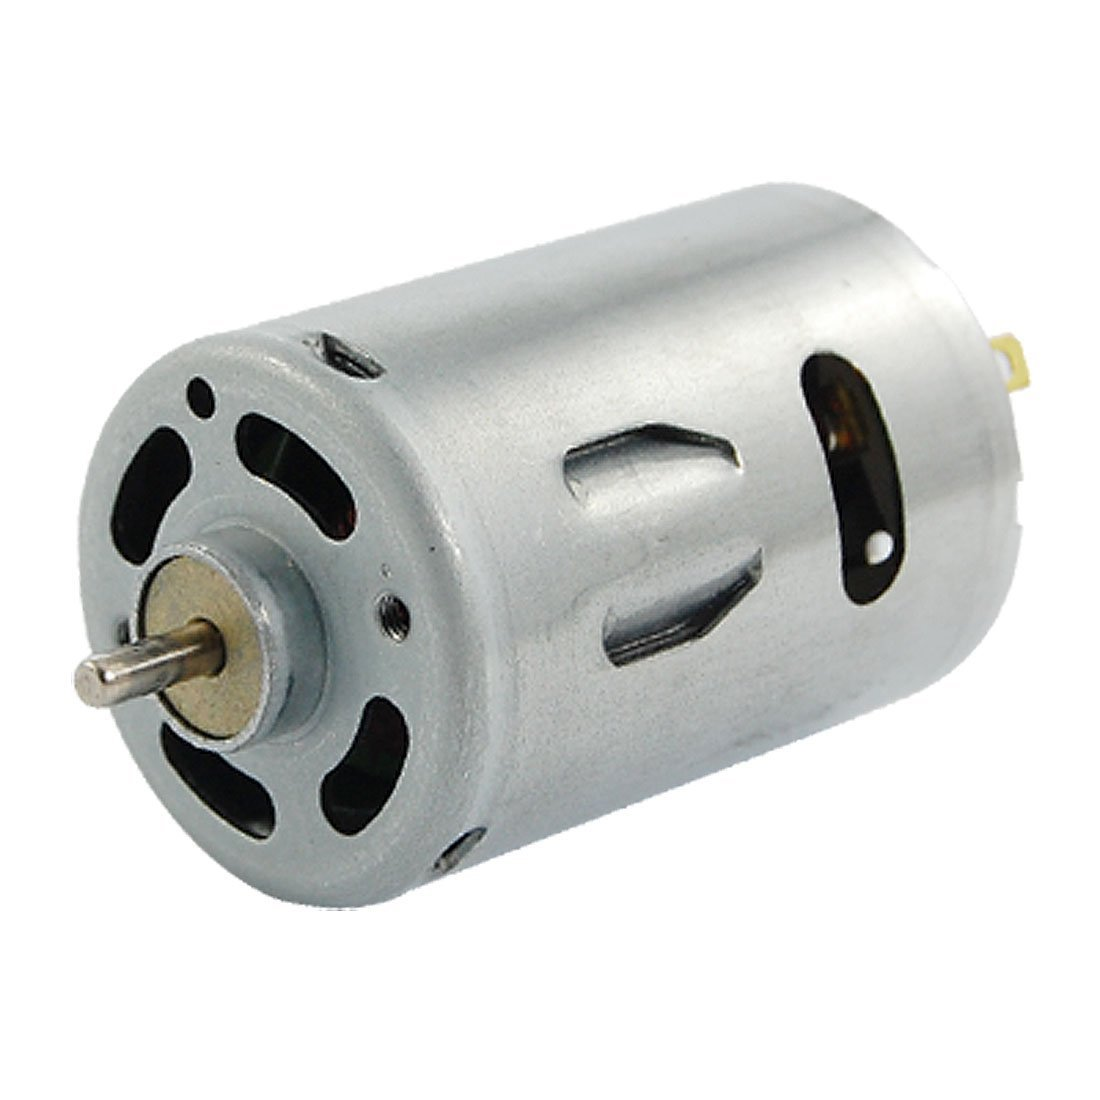 DC 12V 20000RPM 6V 6000RPM Electric Motor for DIY Toys Cars Sourcingmap a11060900ux0403